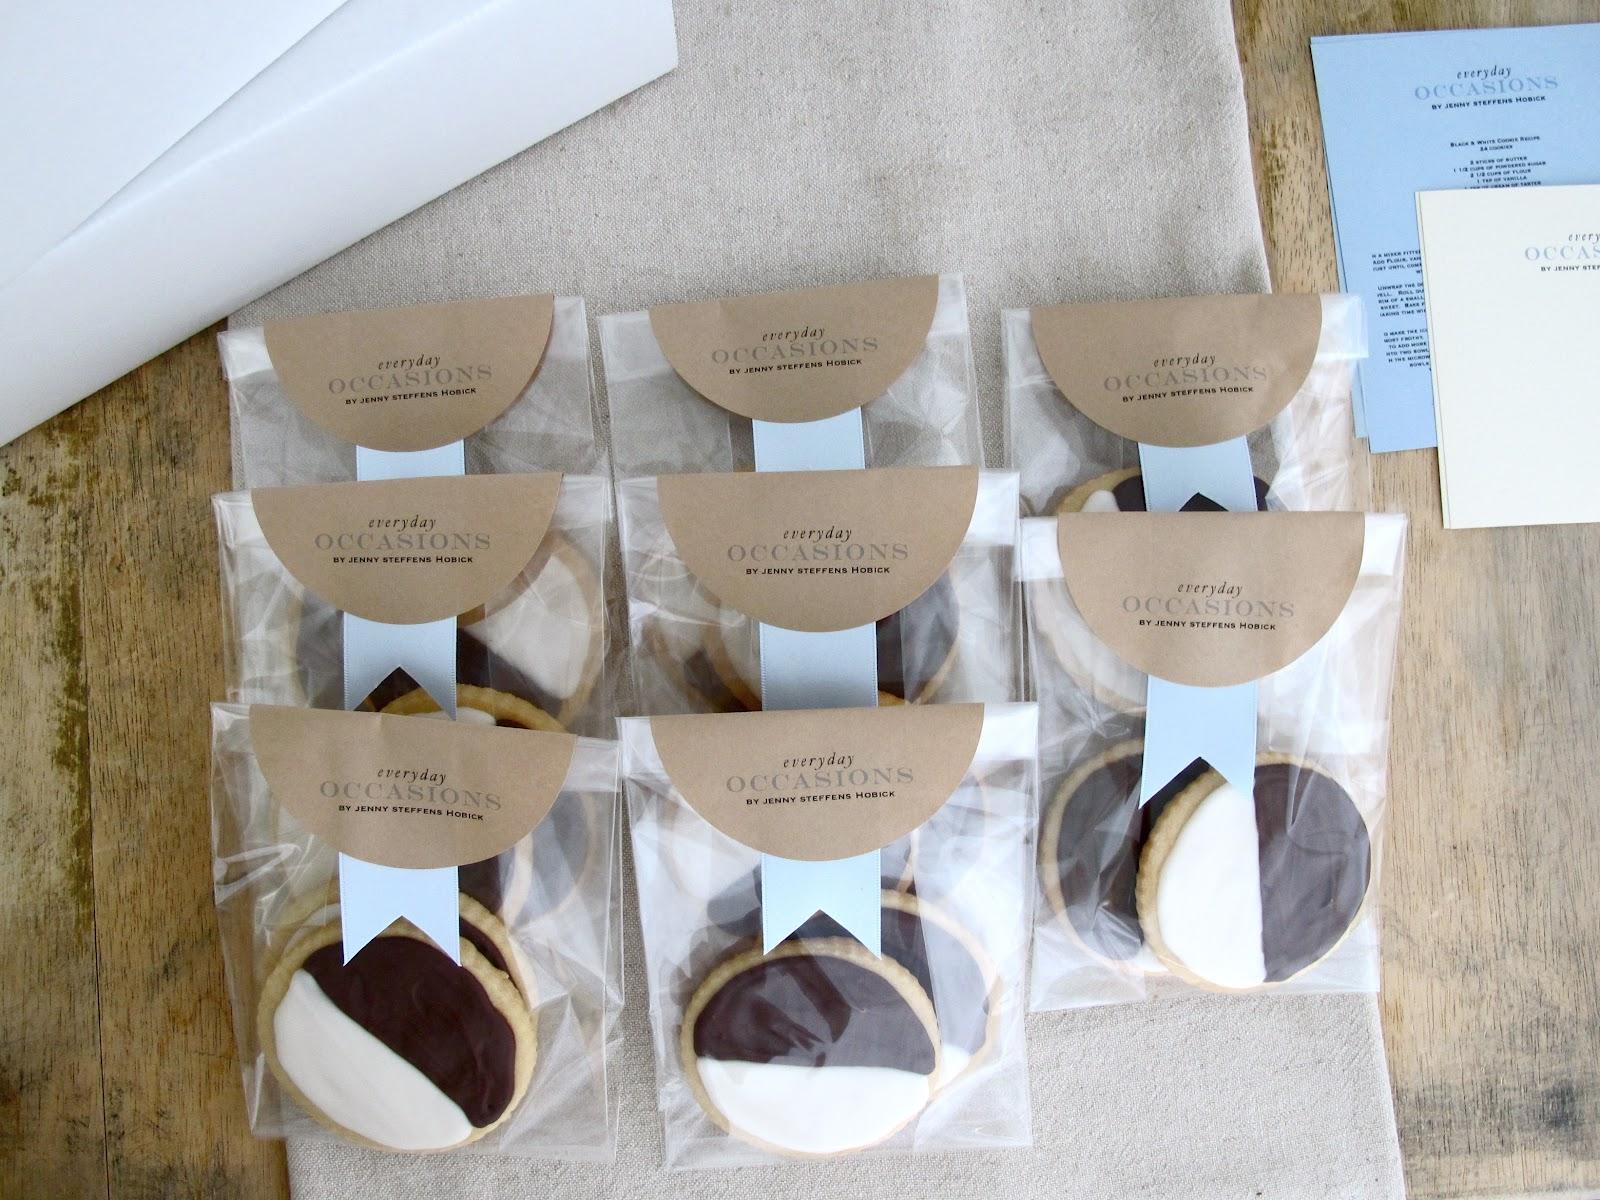 Christmas Packaging For Baked Goods